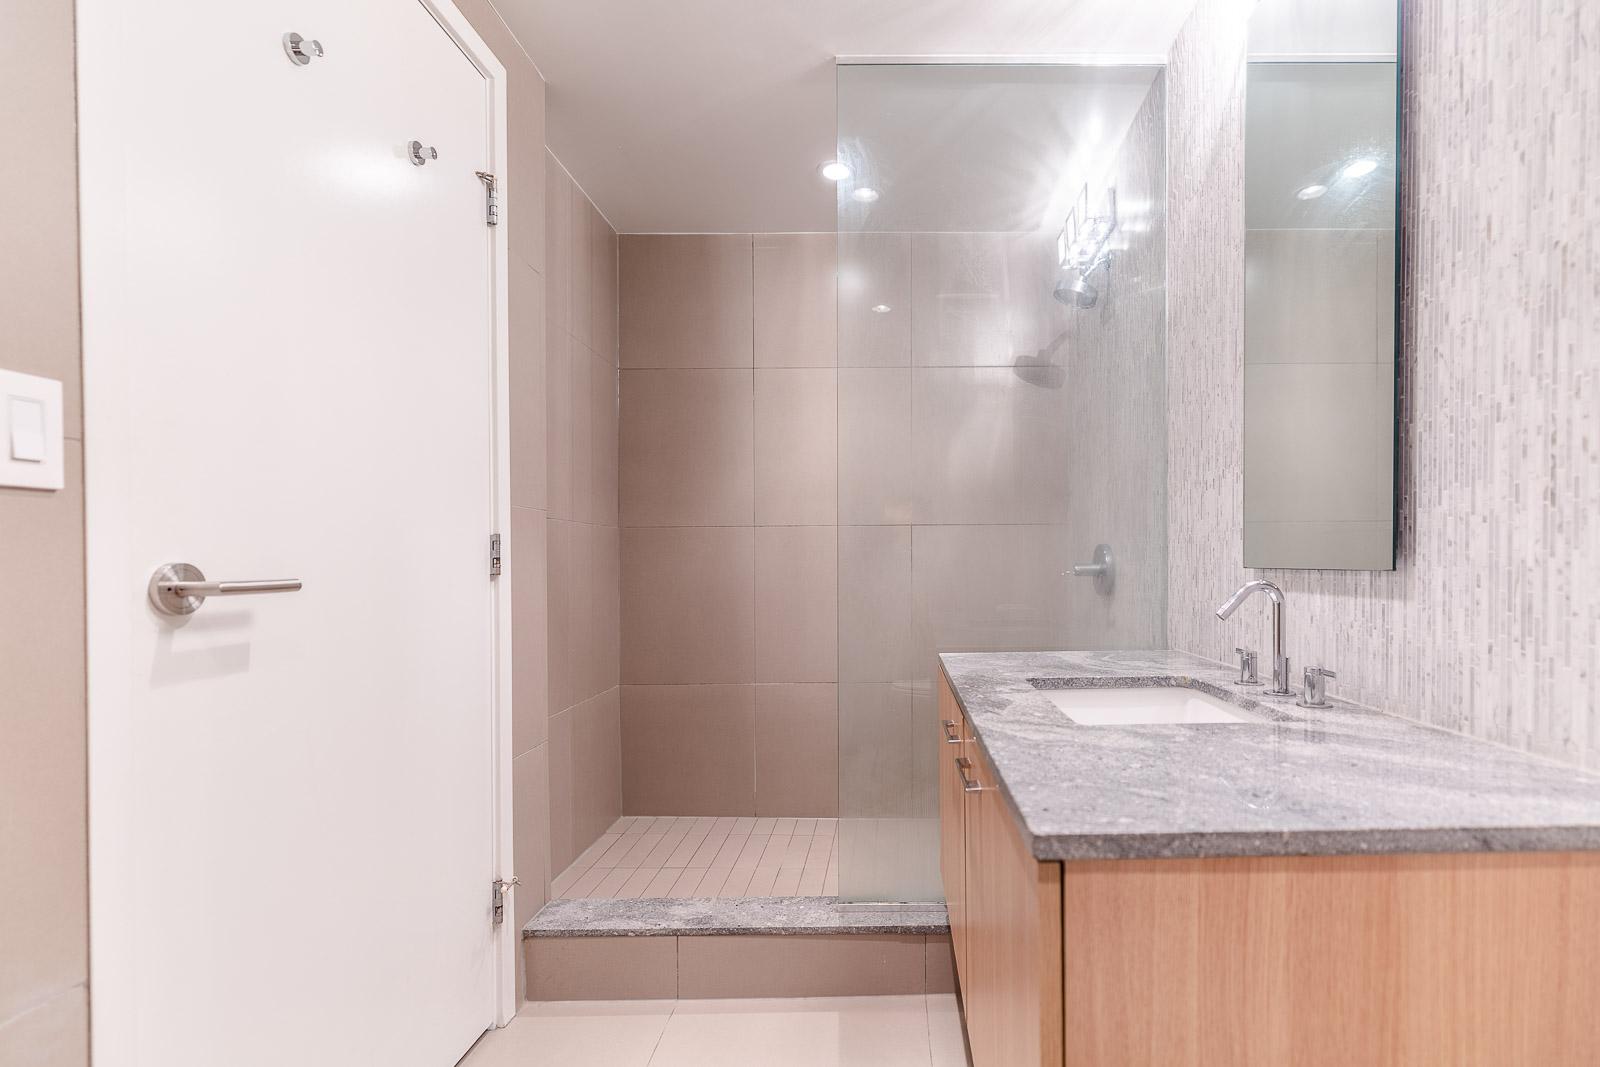 spa-inspired bathroom in Fairview condo